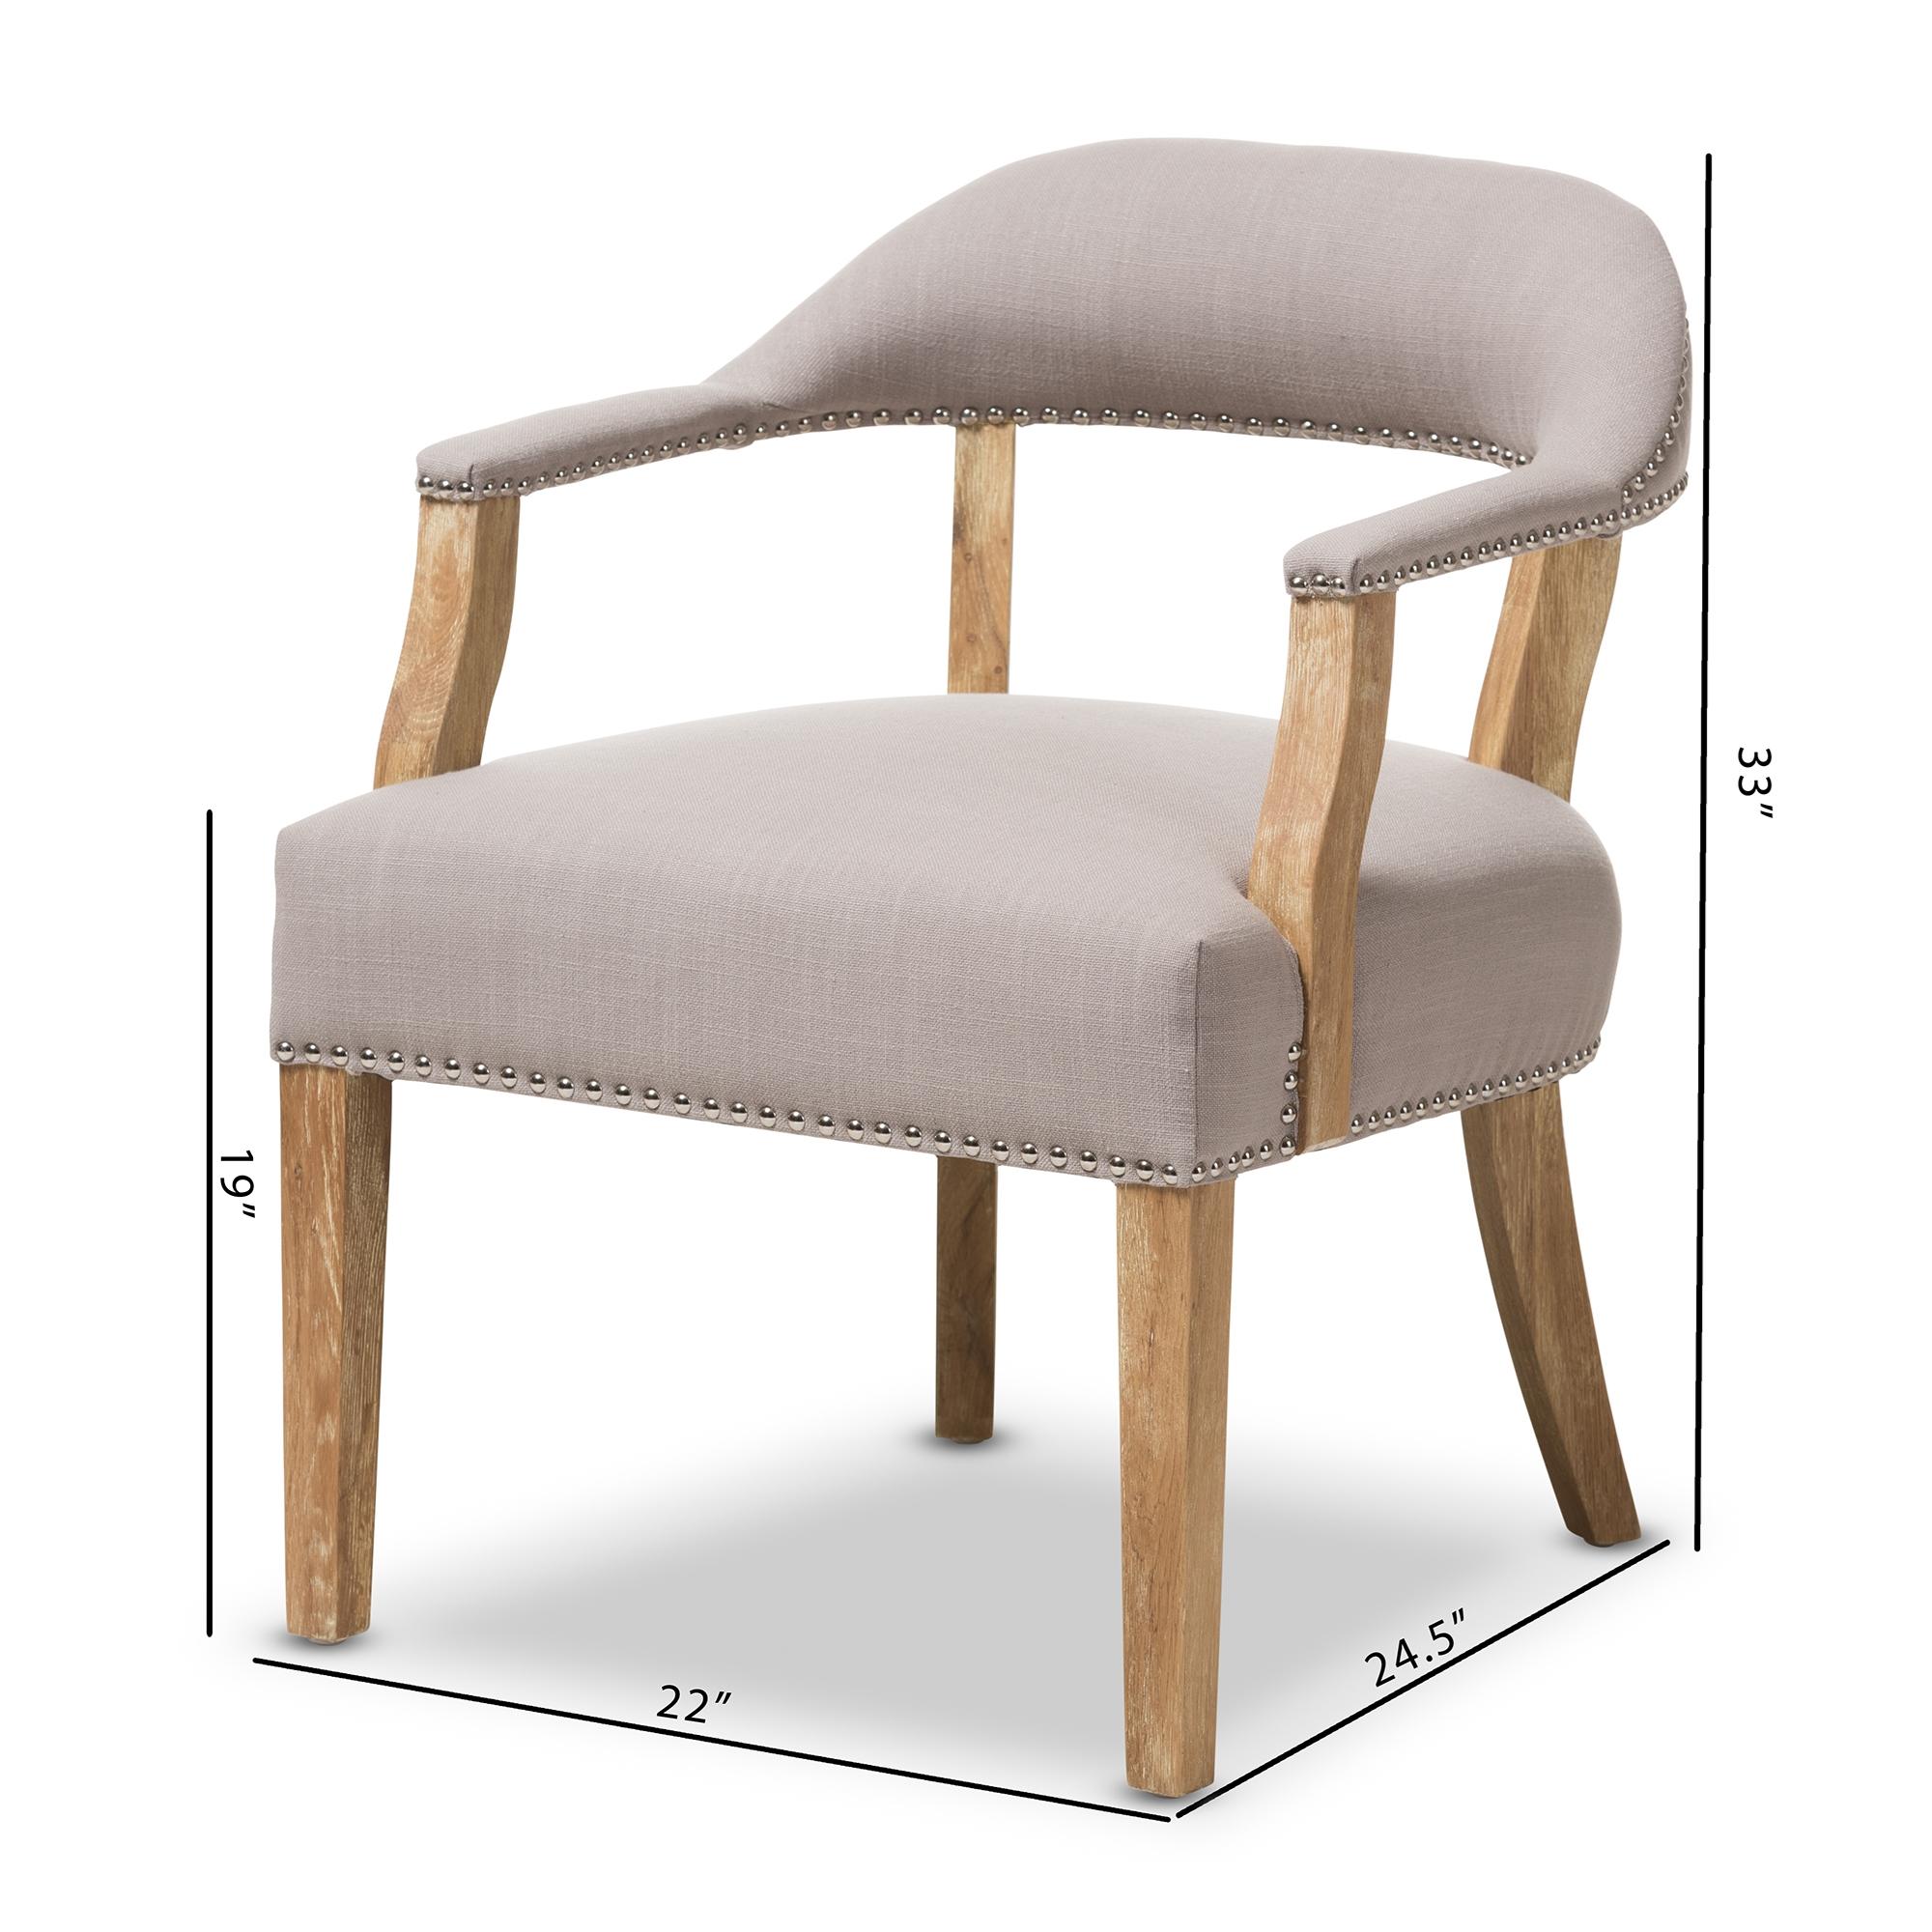 Upholstered Accent Chairs Upholstered Accent Chairs Living Room